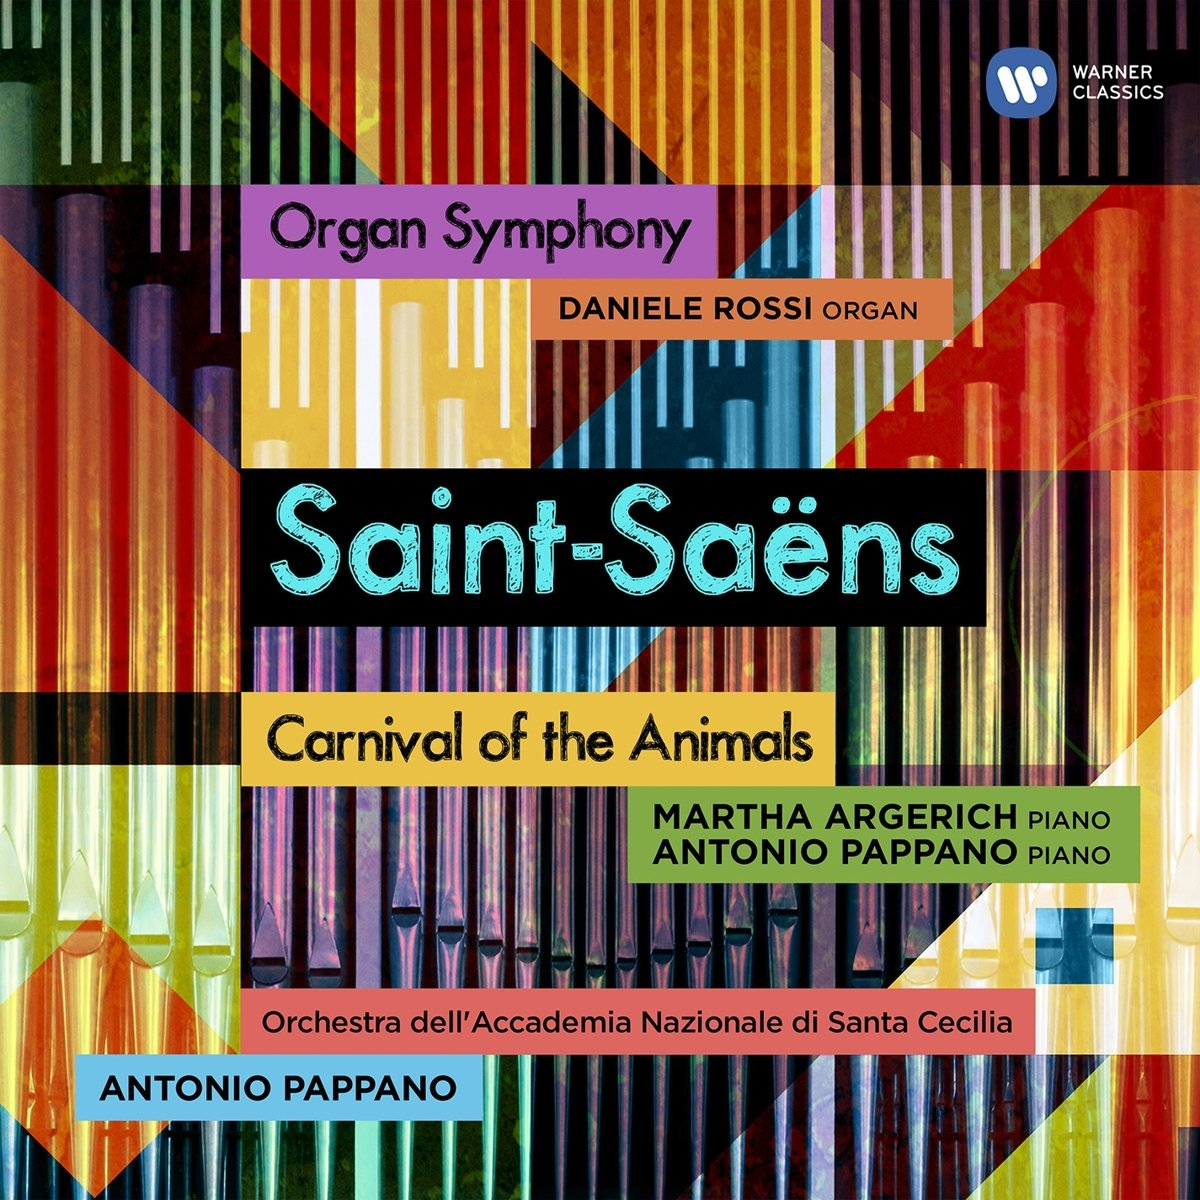 CD : Antonio Pappano - Saint-saens Organ Symphony & Carnival Of Animals (CD)